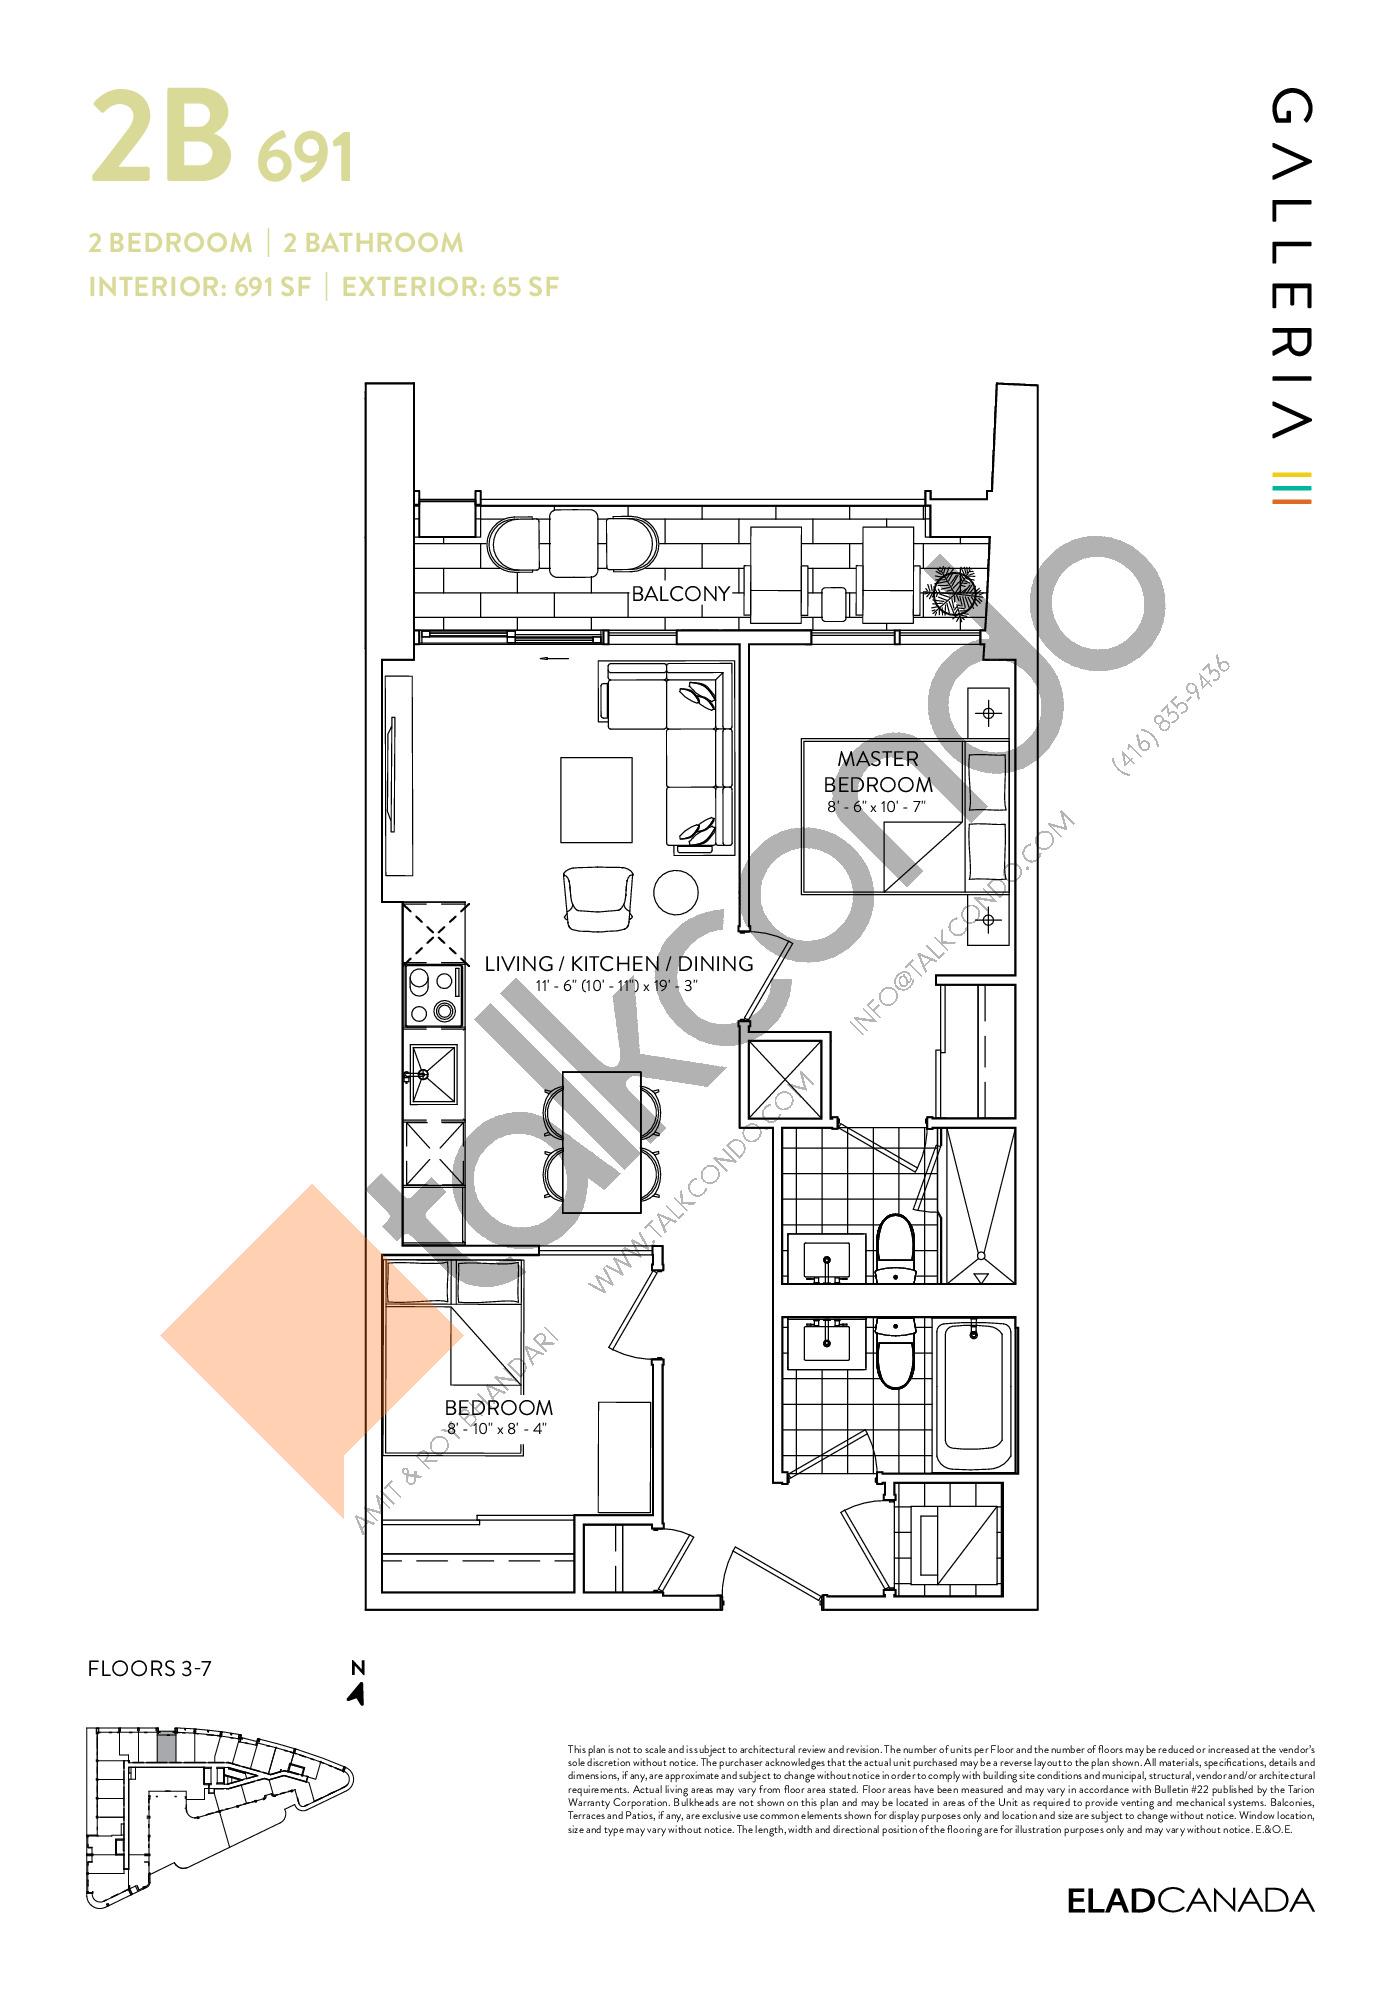 2B 691 Floor Plan at Galleria 03 Condos - 691 sq.ft